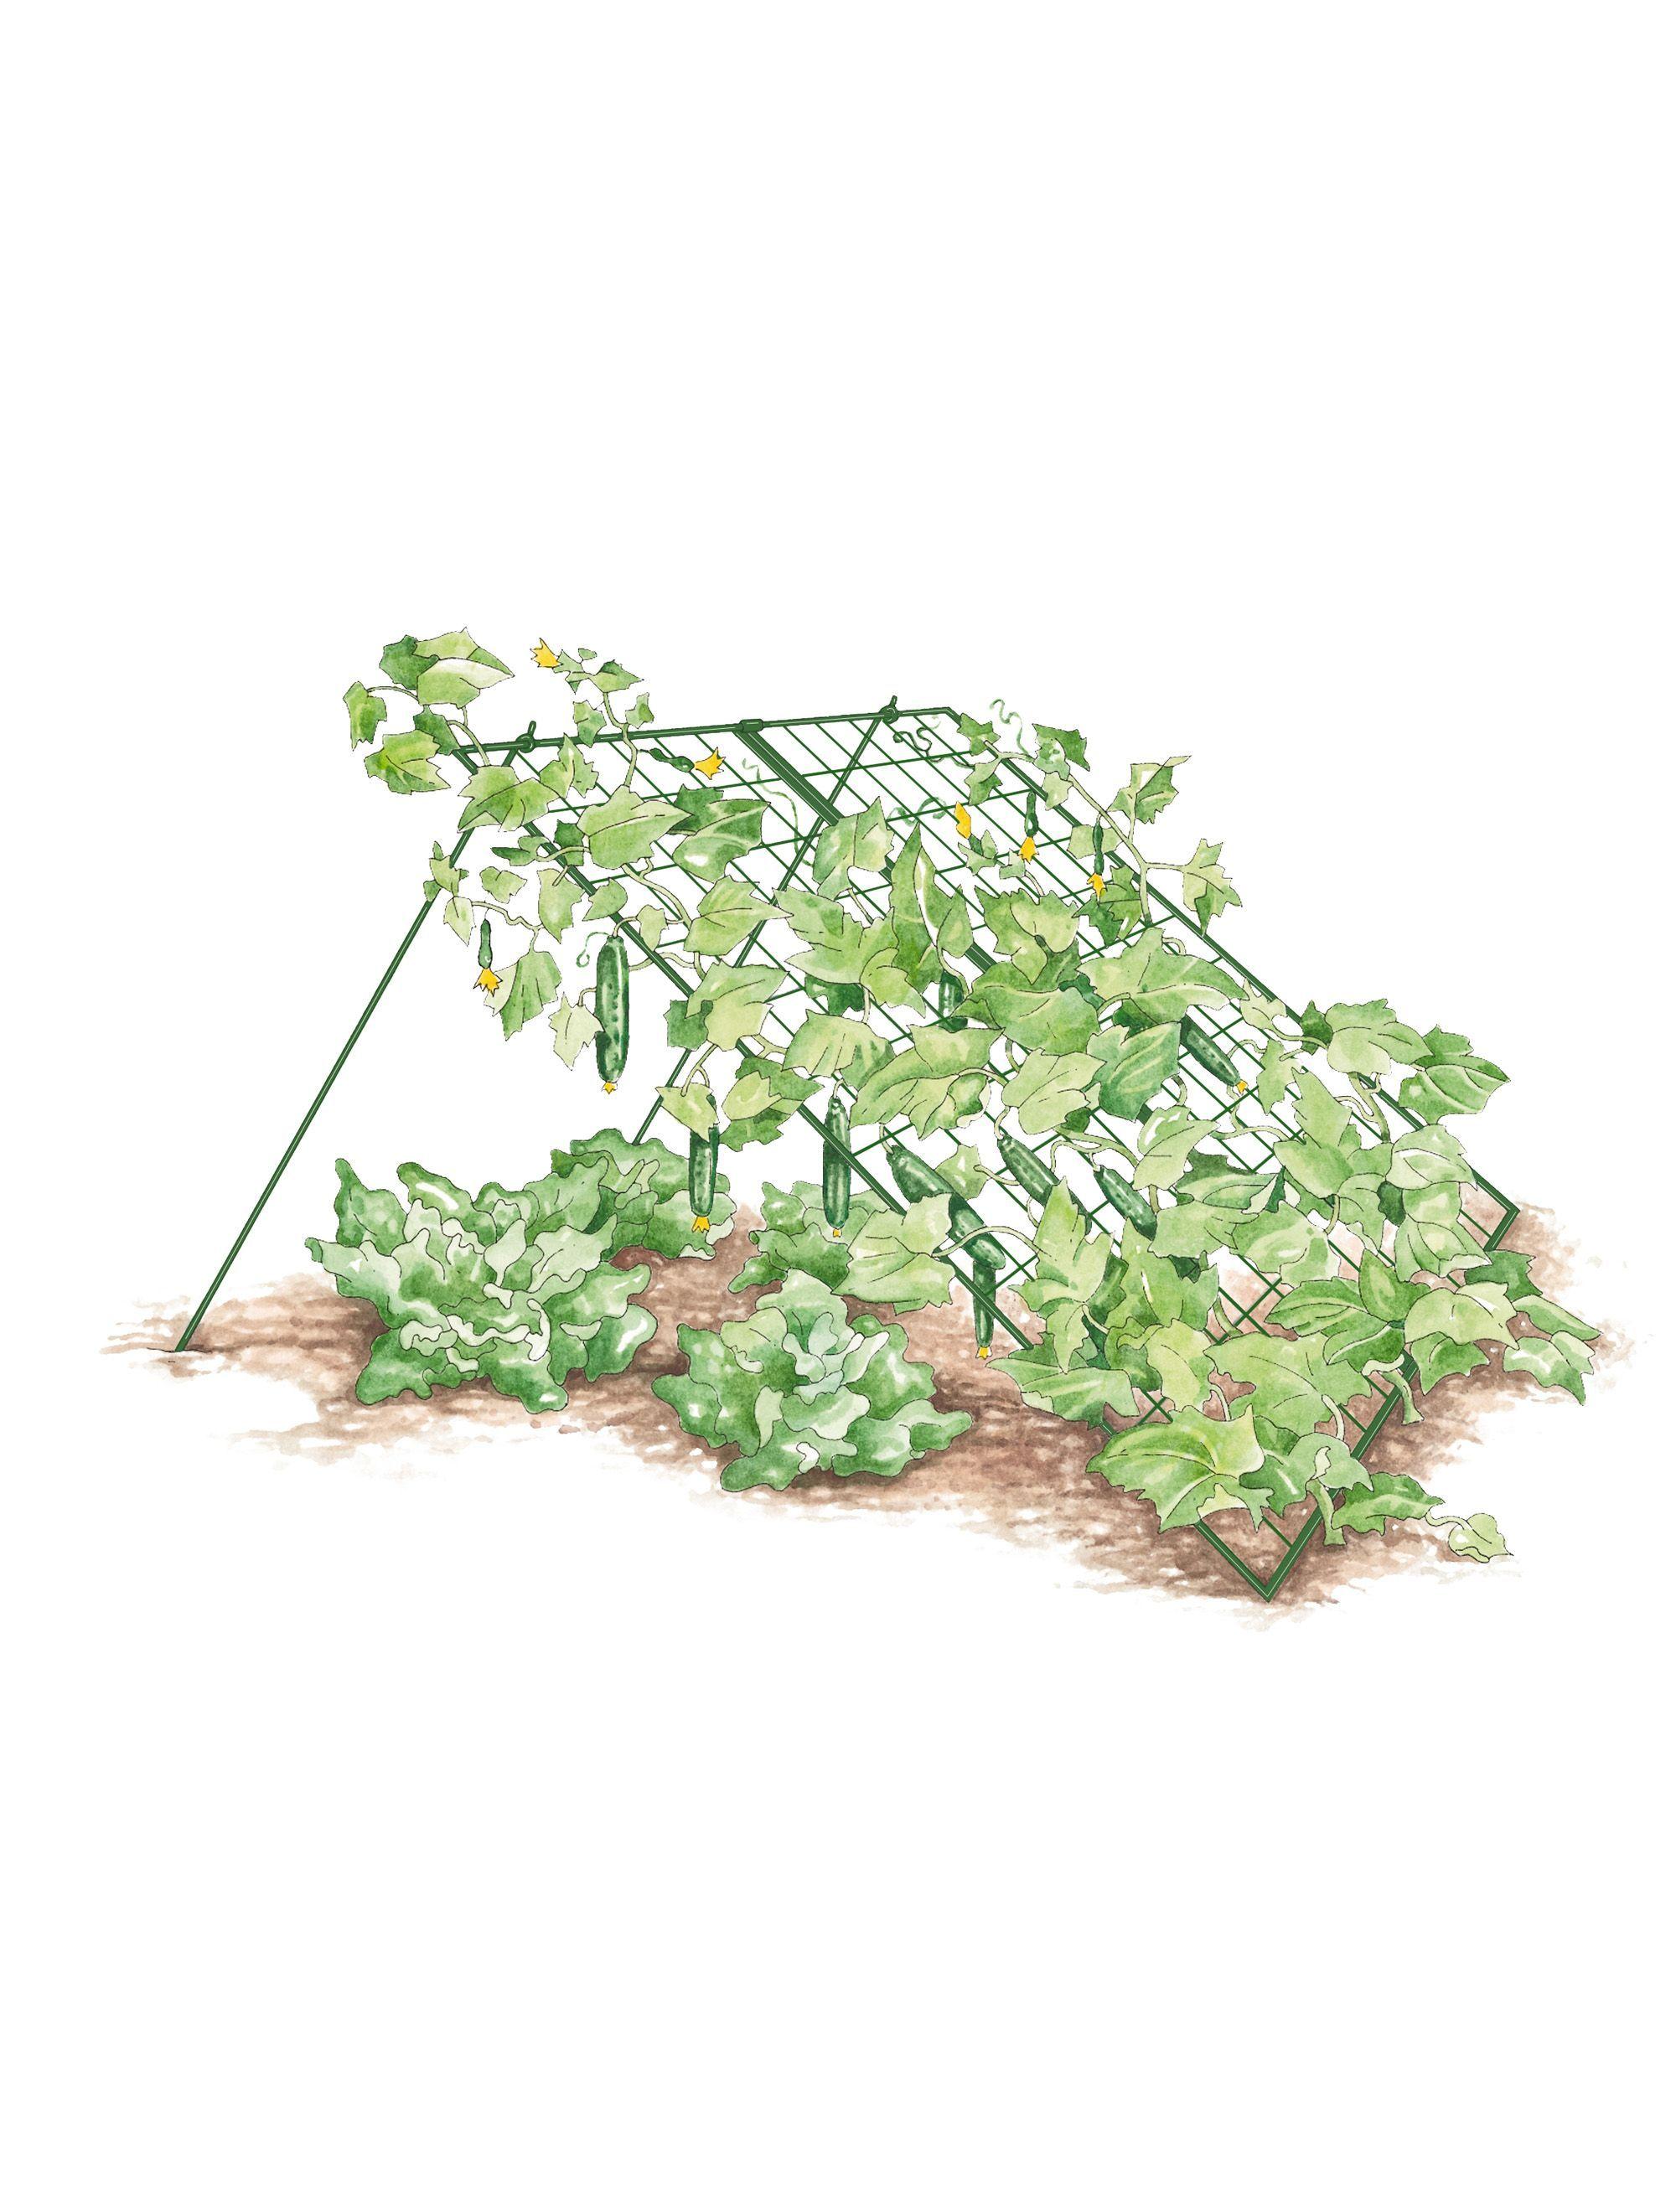 684d141c699b0dbe27e397f297b9630e - Gardener's Supply Company Large Cucumber Trellis